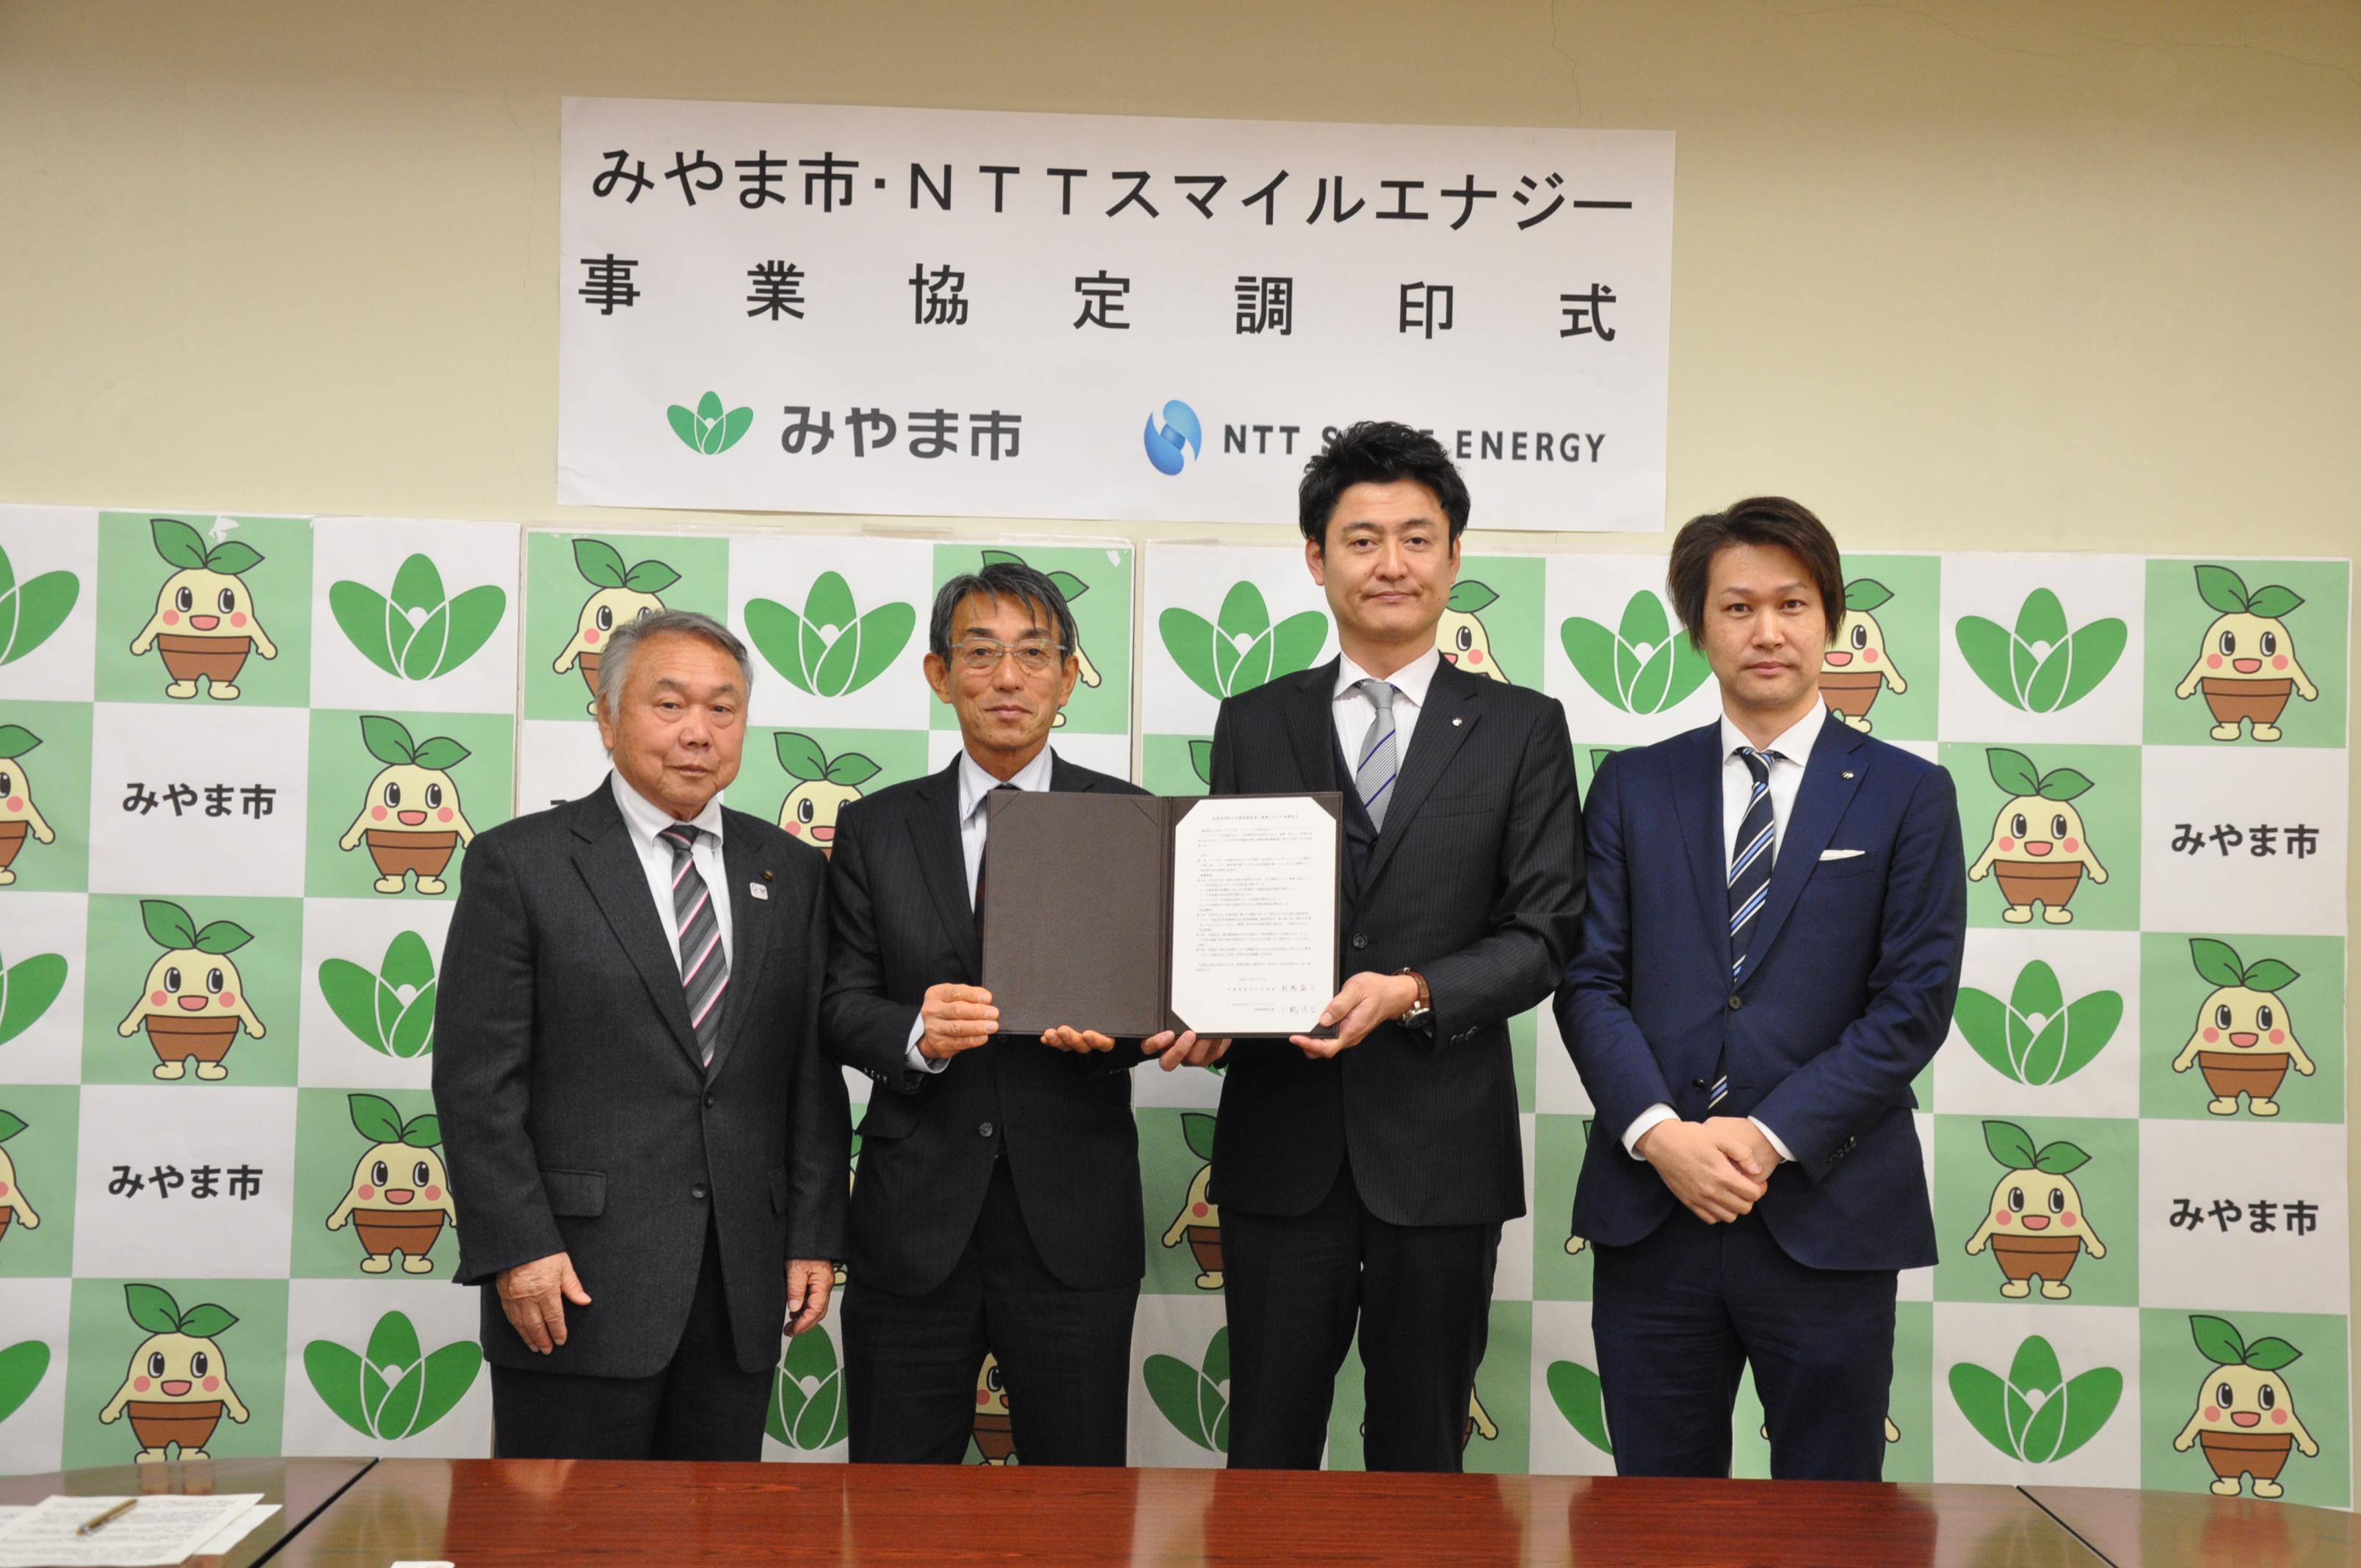 NTTスマイルエナジー みやま市 事業協定調印式